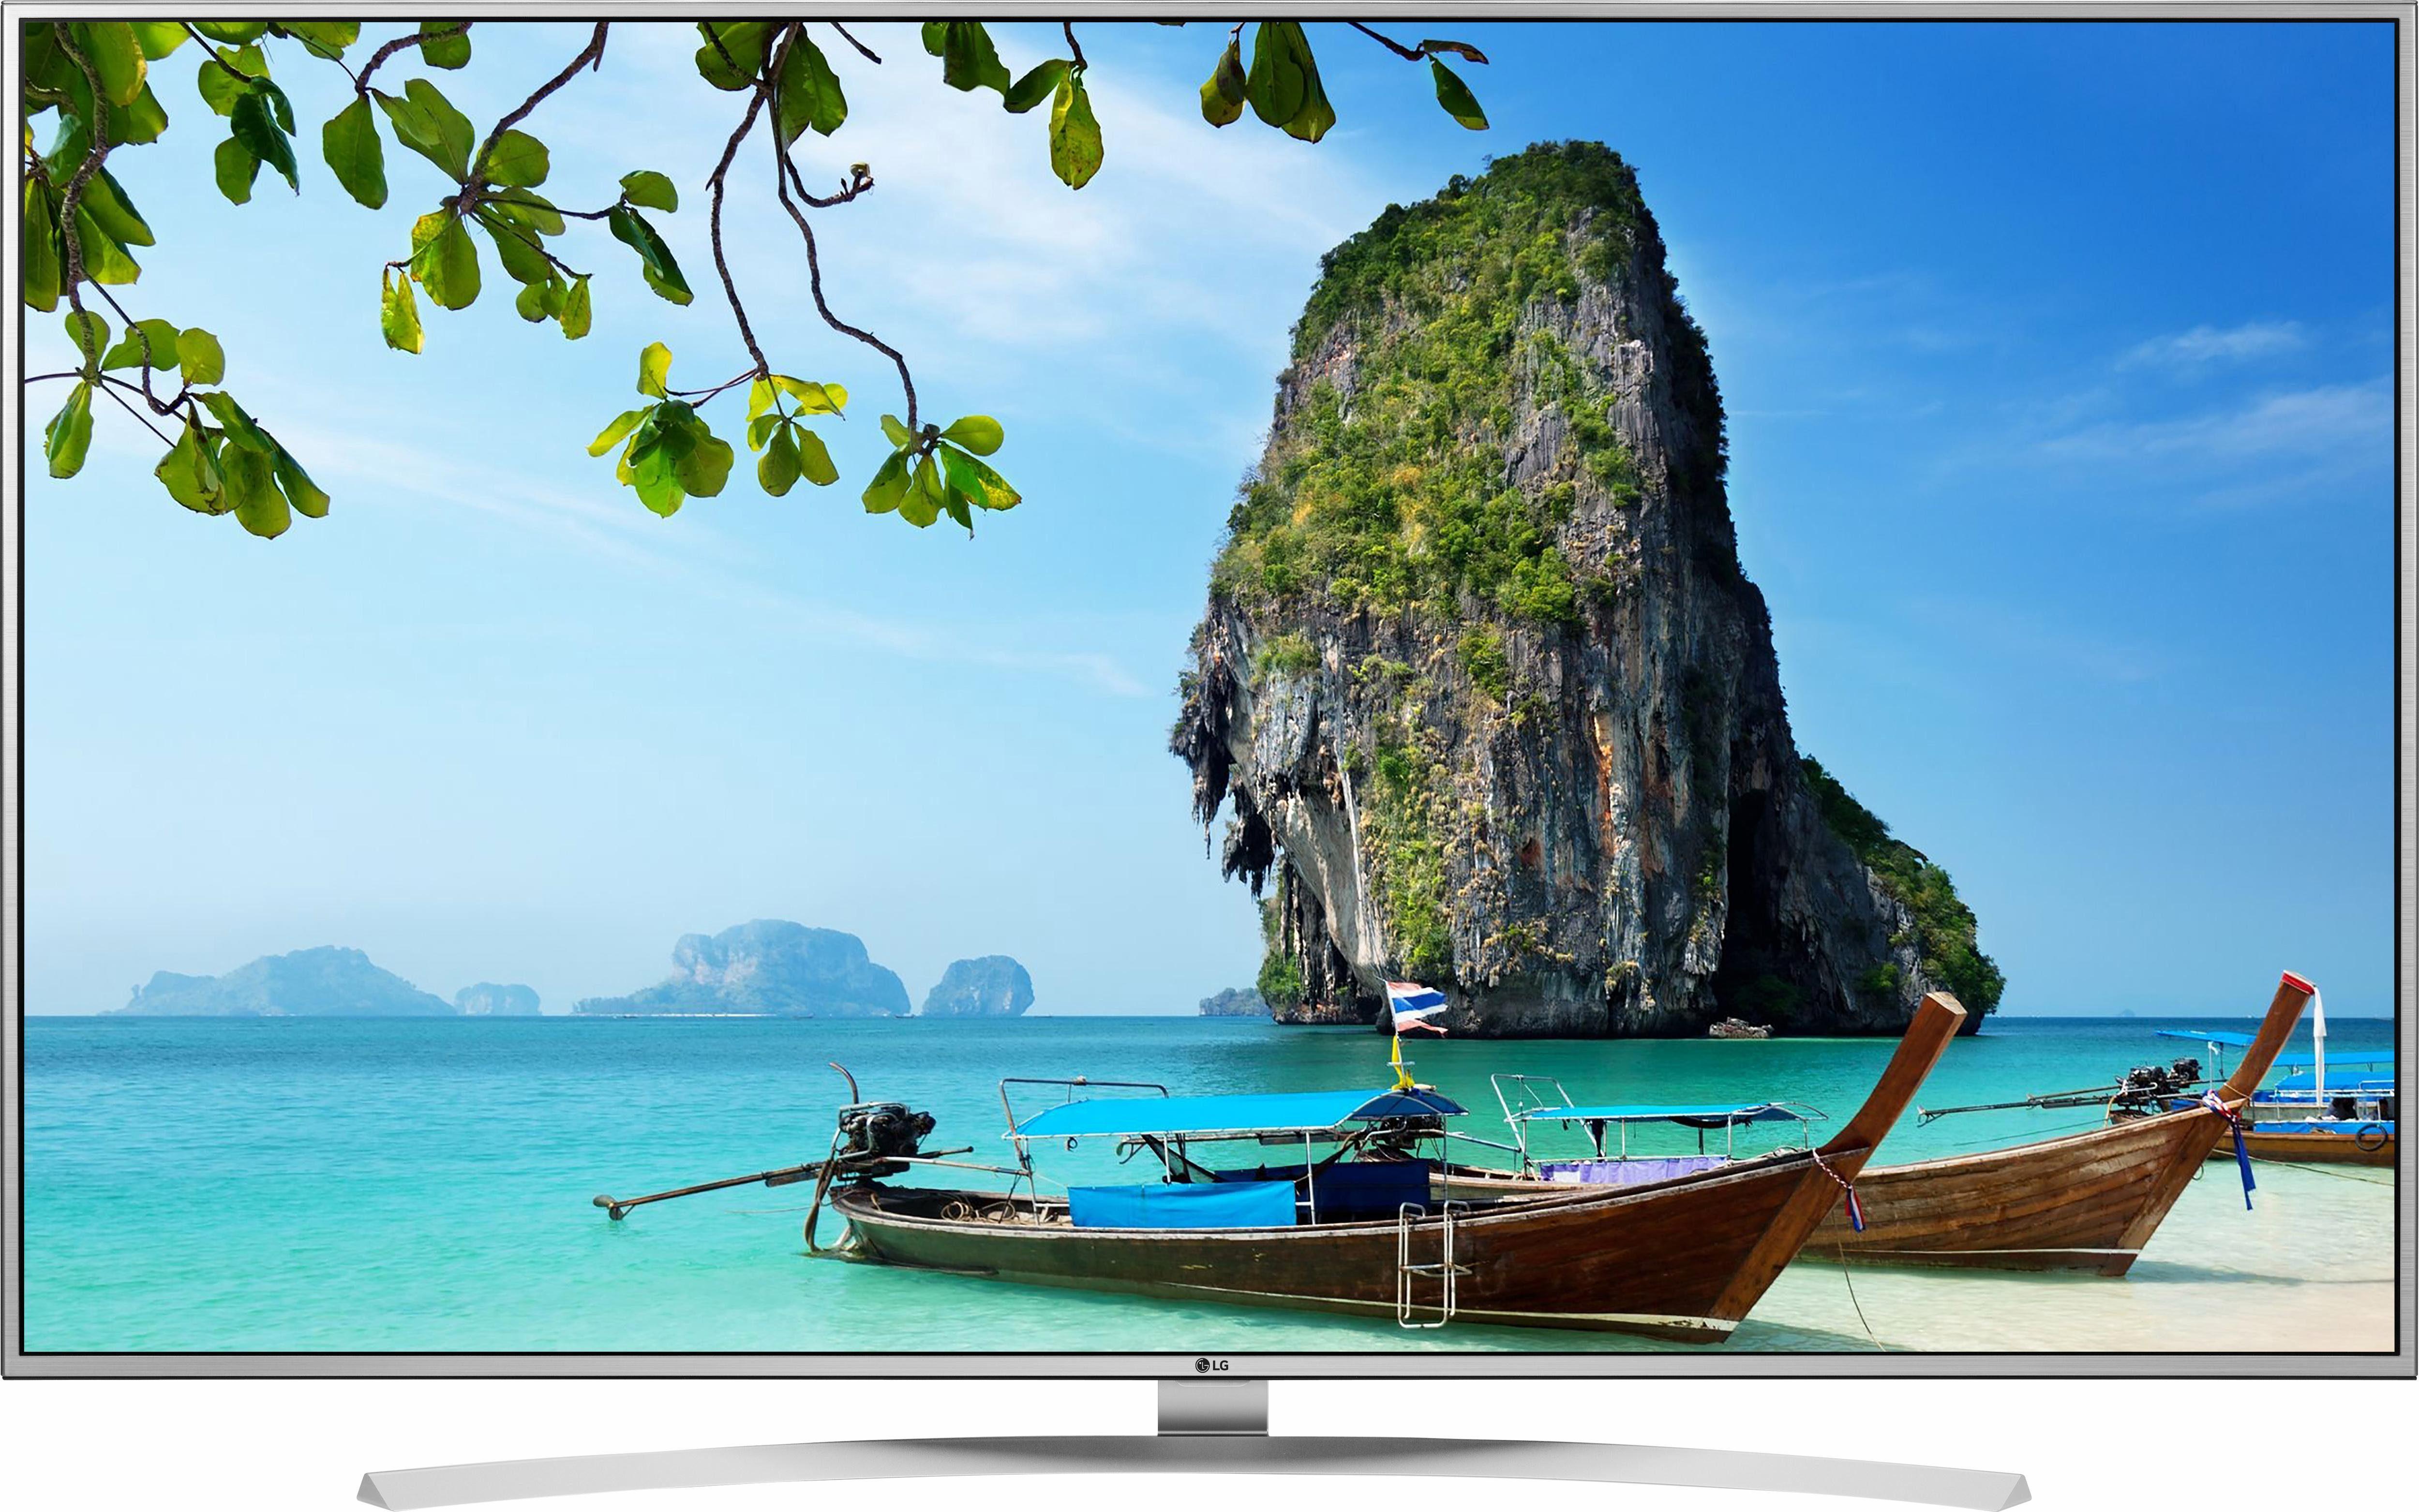 LG 49UH7709, LED Fernseher, 123 cm (49 Zoll), 2160p (4K Ultra HD), Smart-TV